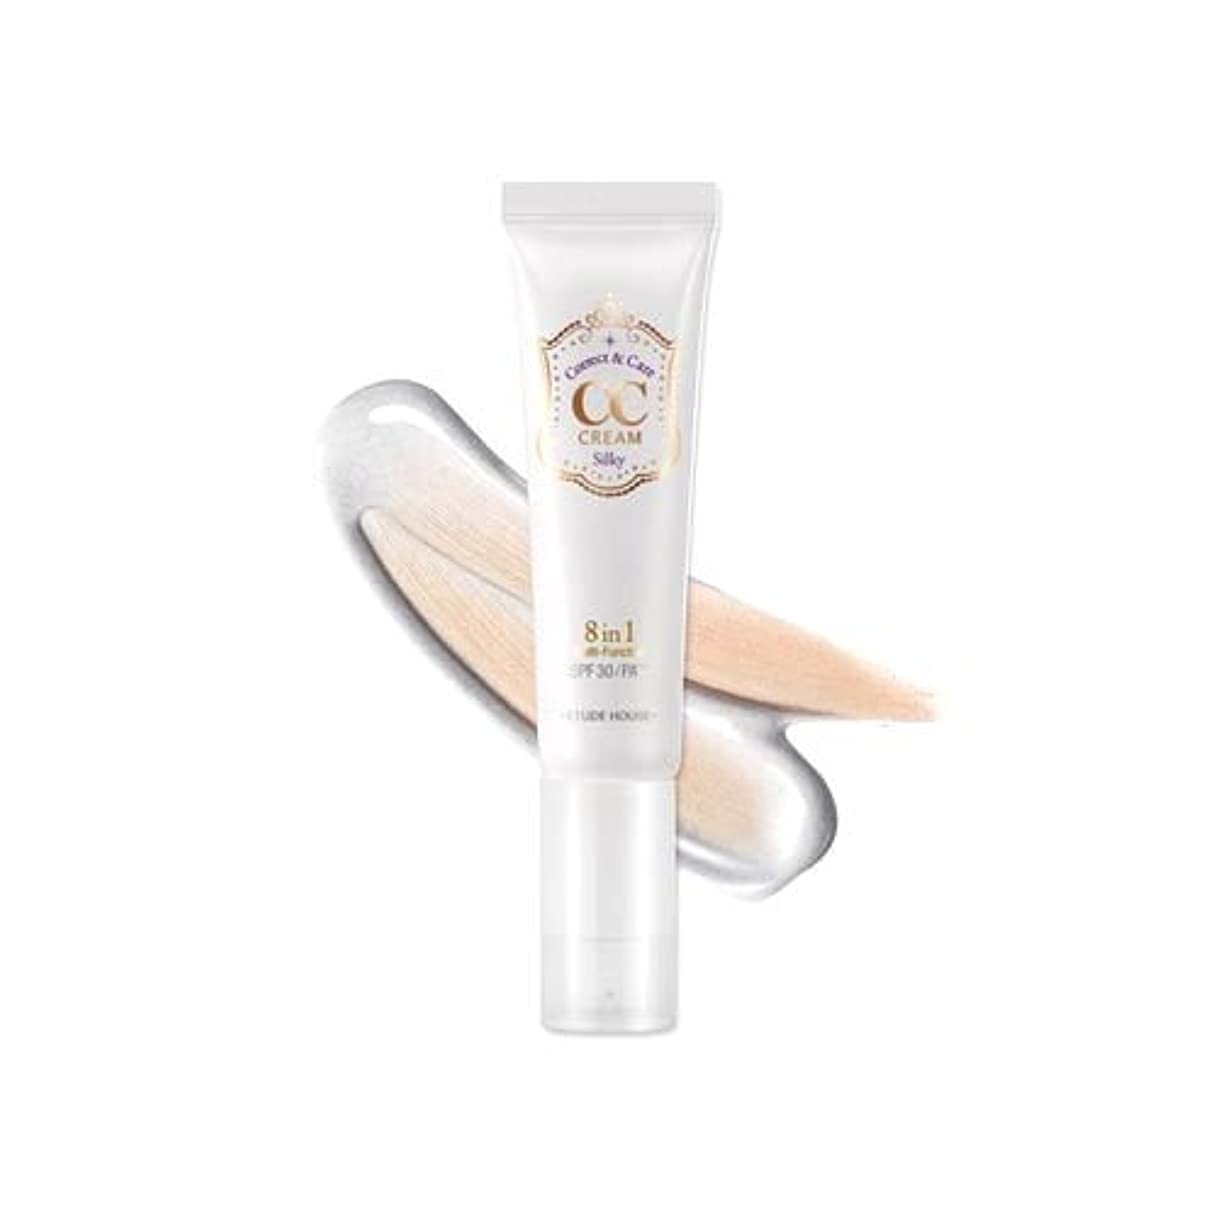 許可熟達教え(6 Pack) ETUDE HOUSE CC Cream - #01 Silky (並行輸入品)